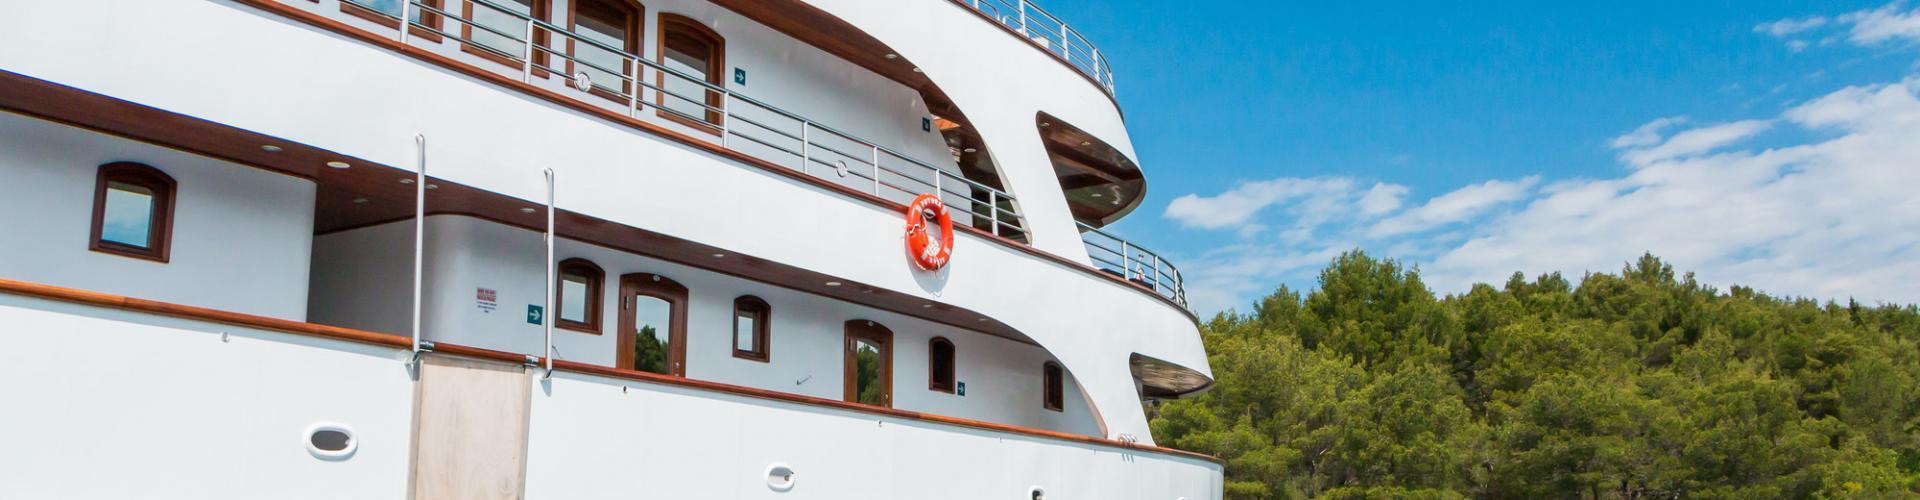 2013. Deluxe Superior cruiser MV Futura